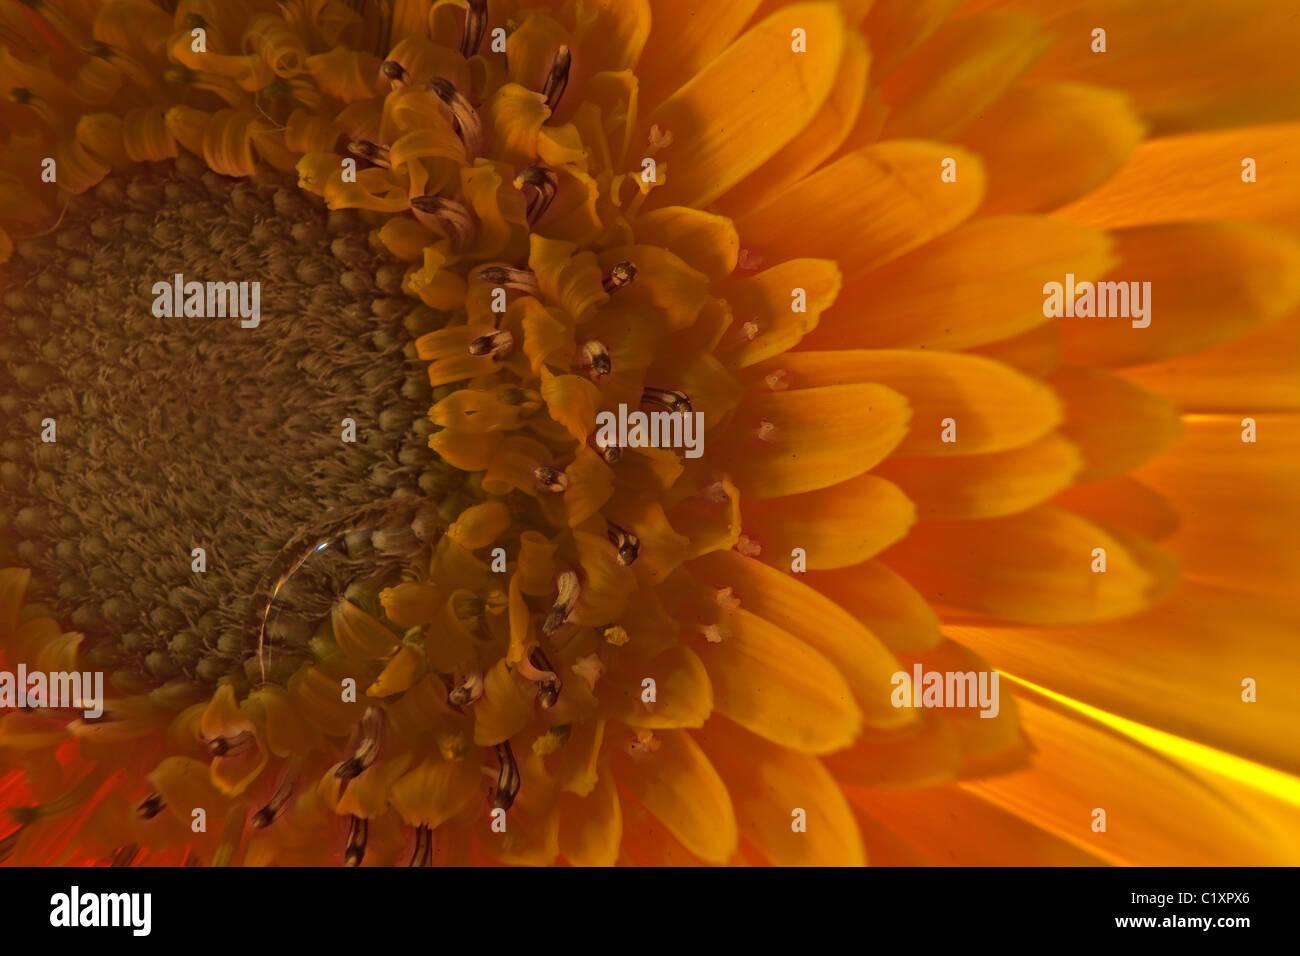 Macro Waterdrop Flower Gerber Daisy - Stock Image